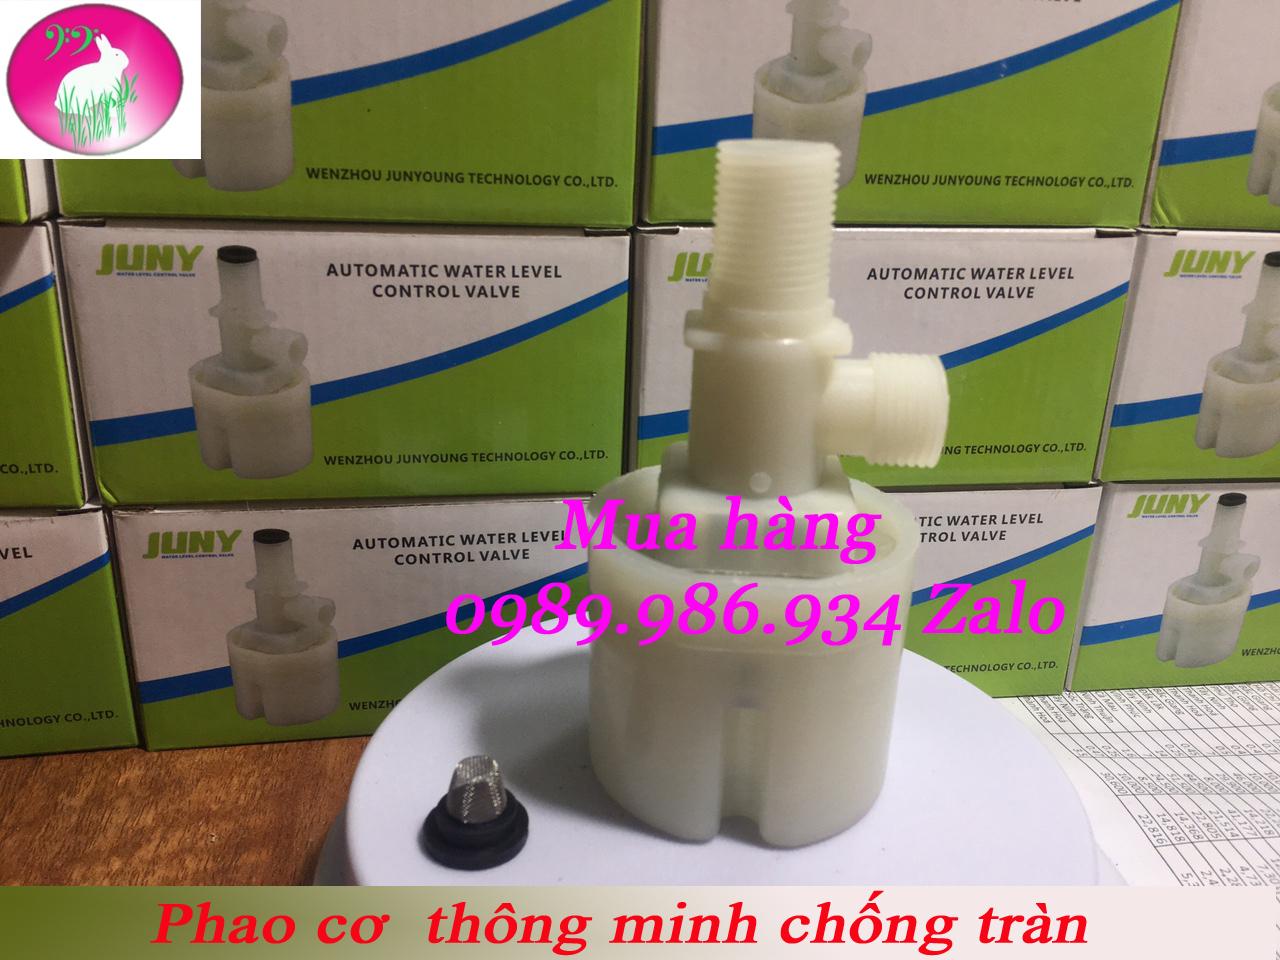 phao-co-chong-tran-jpg.45040